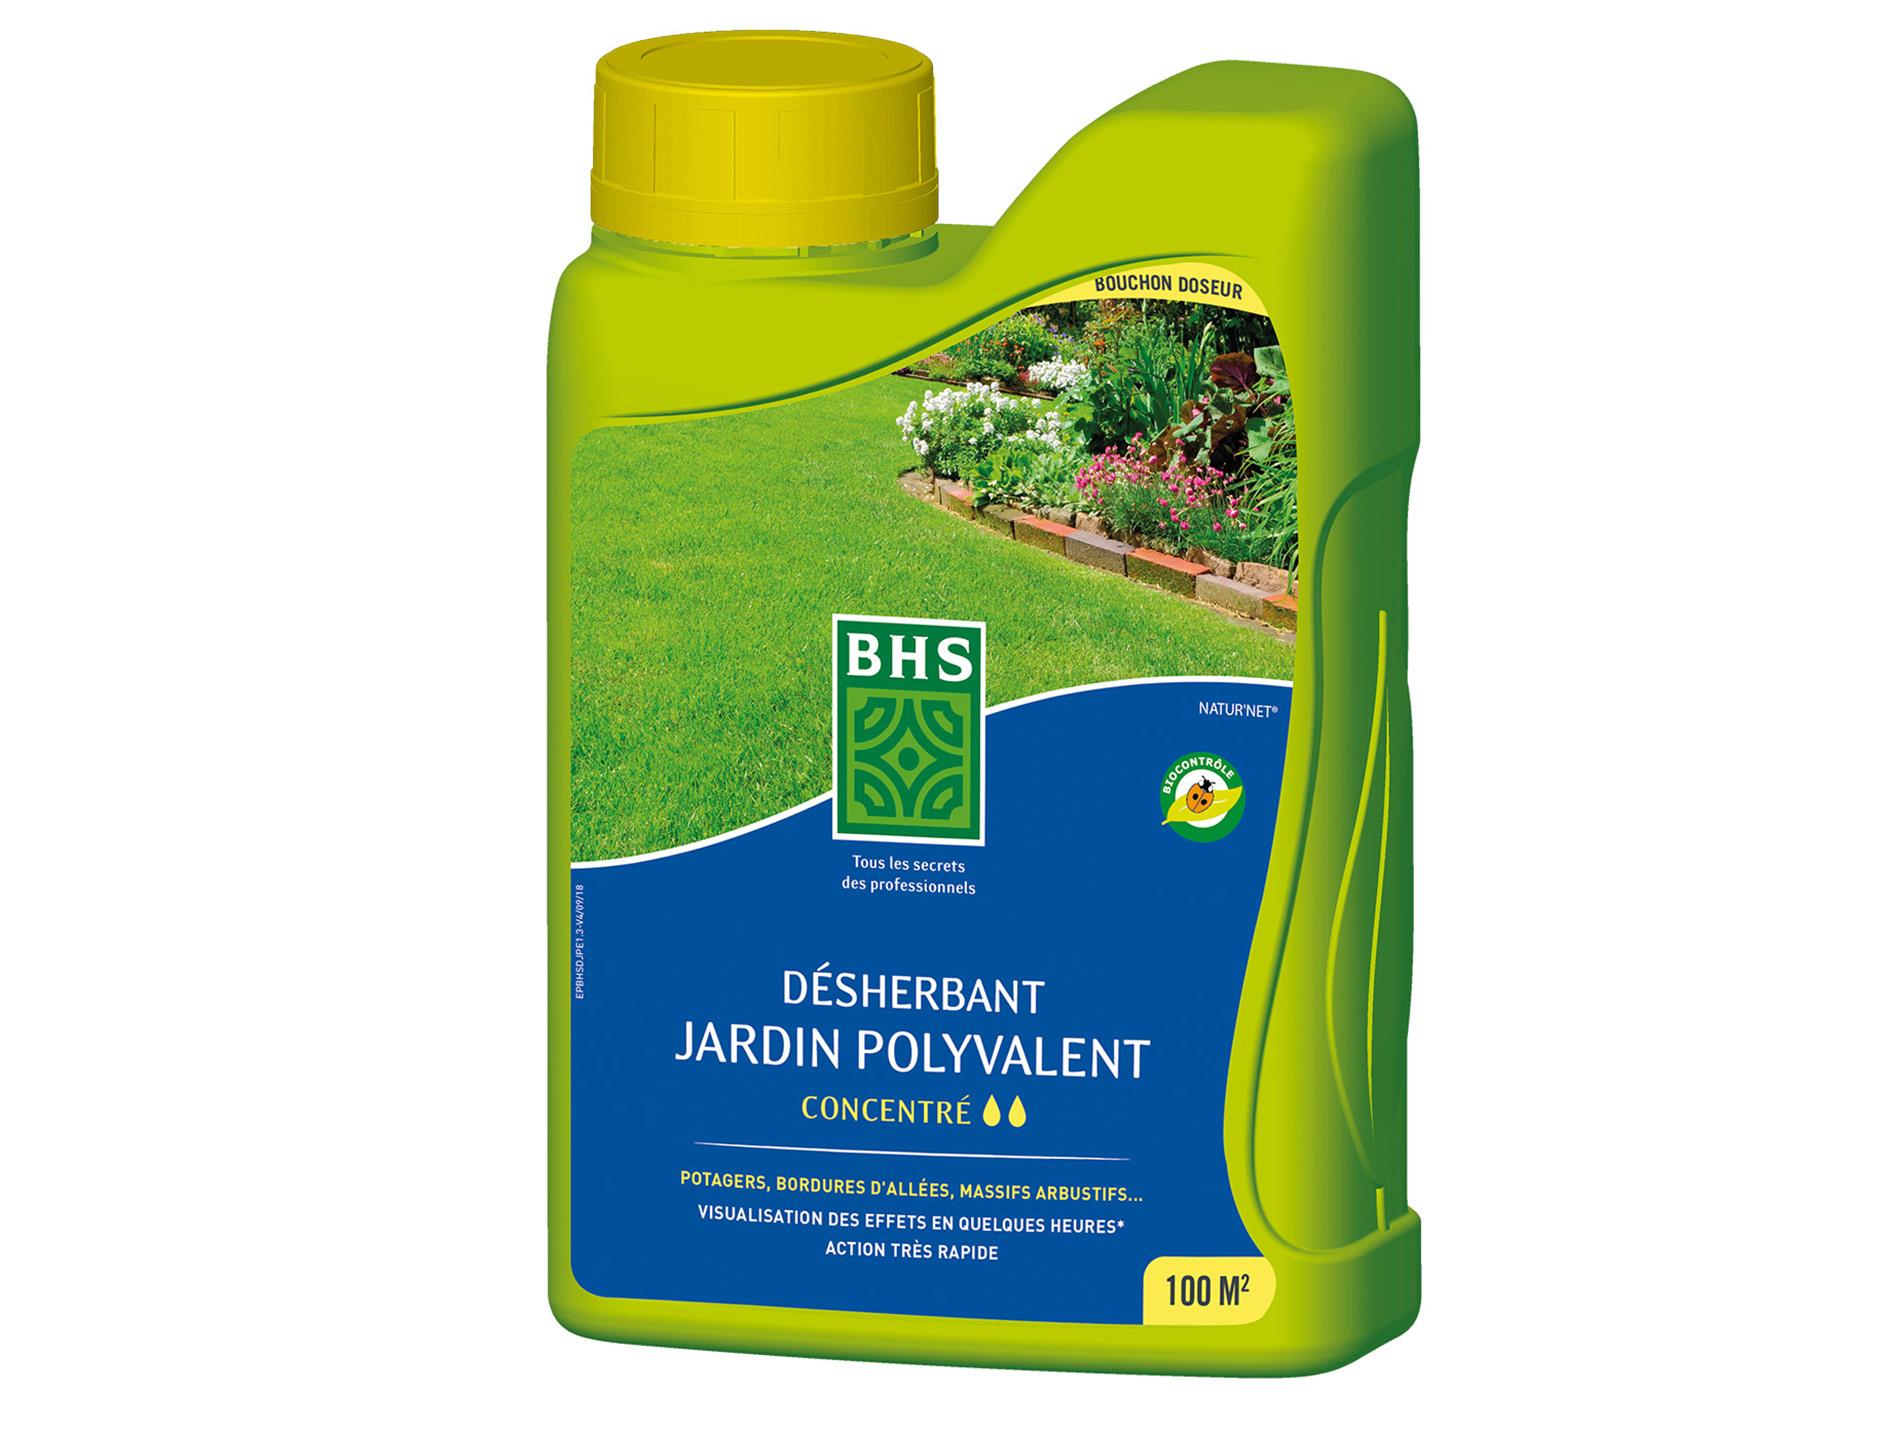 D sherbant jardin polyvalent express 1 3l d sherbant Desherbant jardin